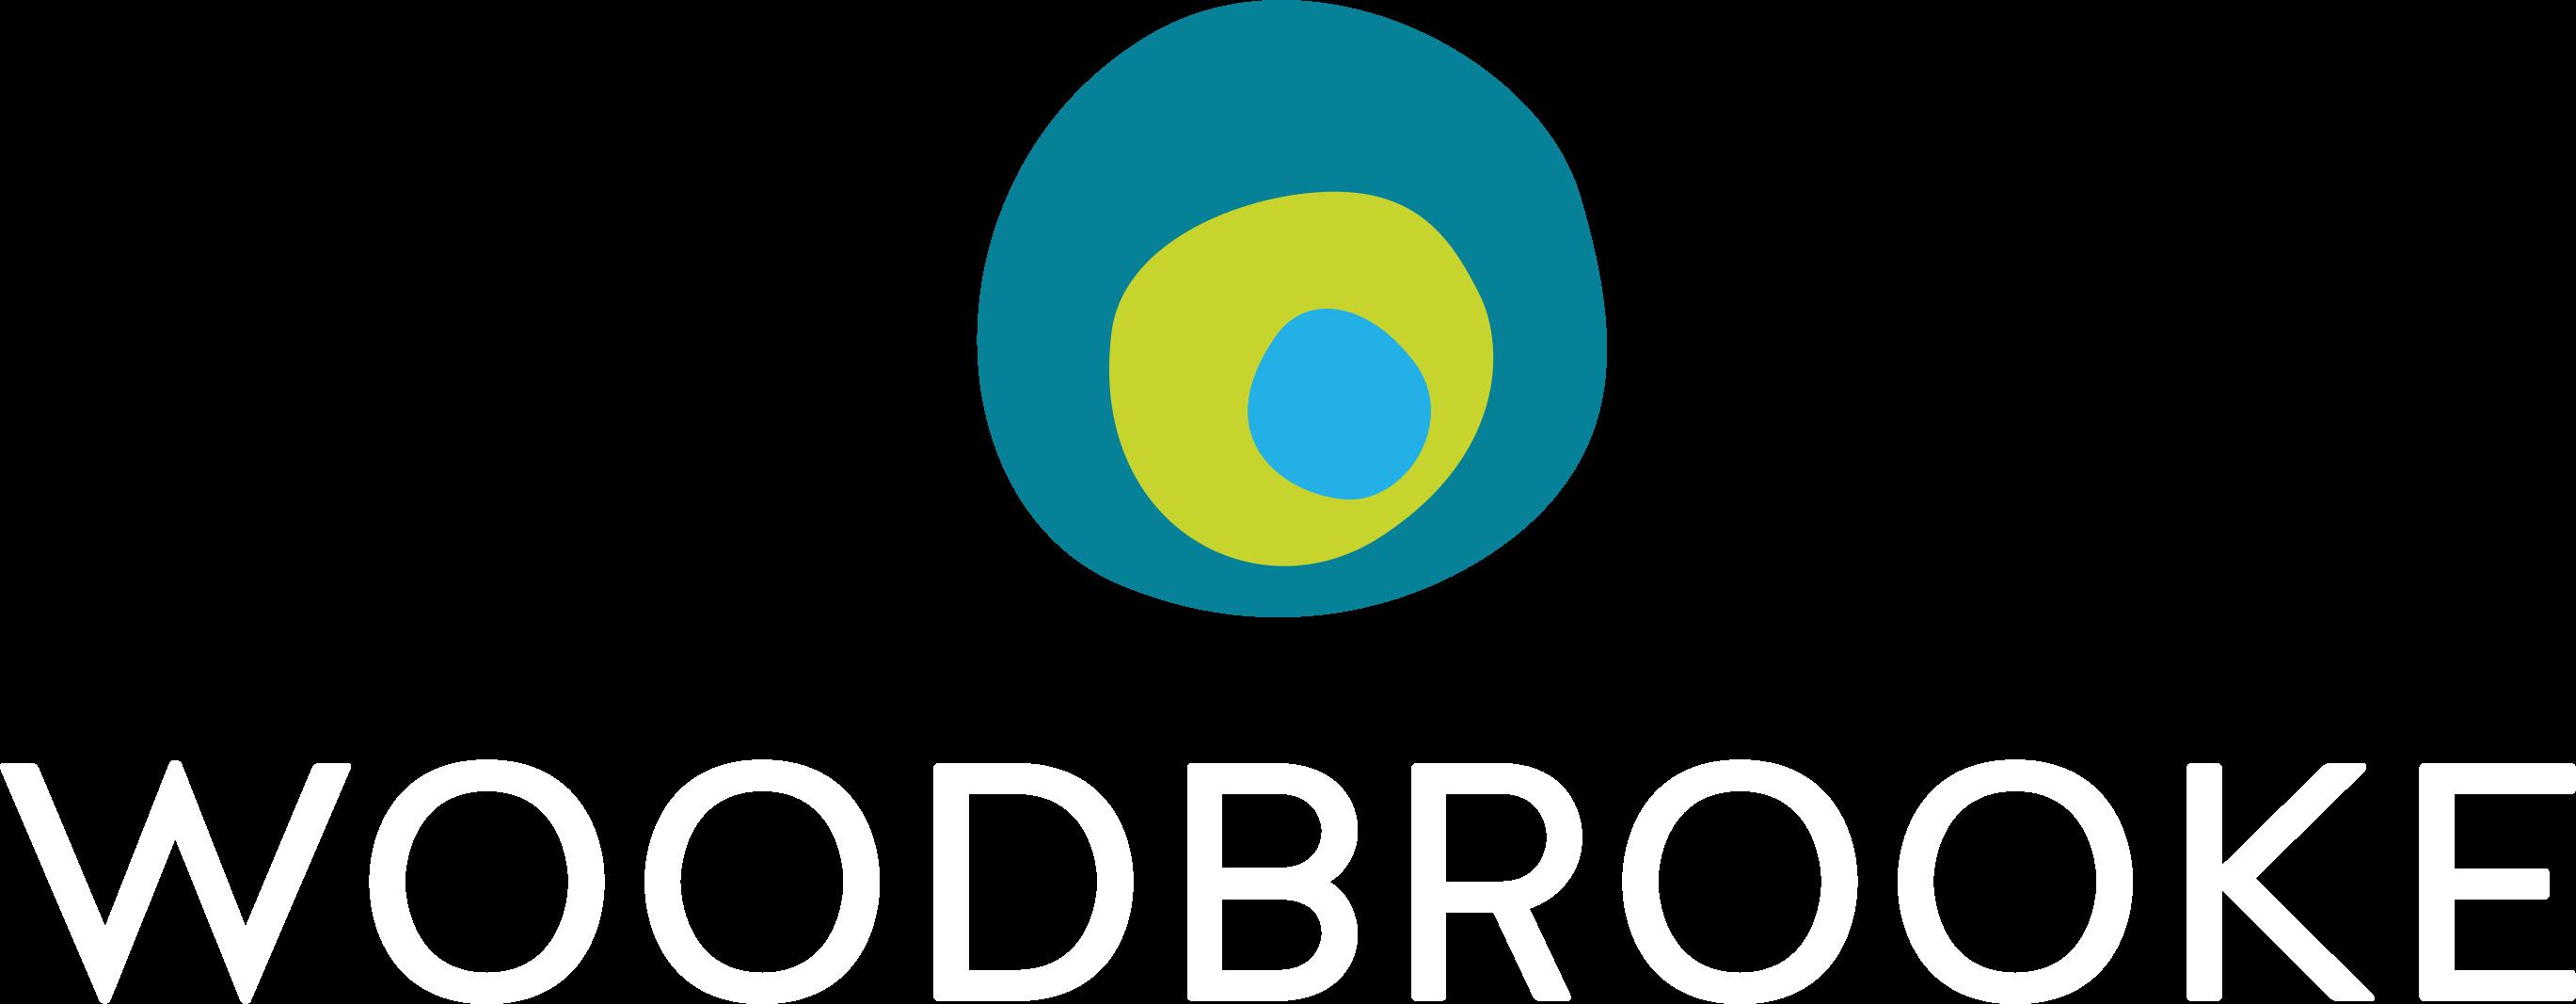 Woodbrooke-logo-portrait-CMYK-white